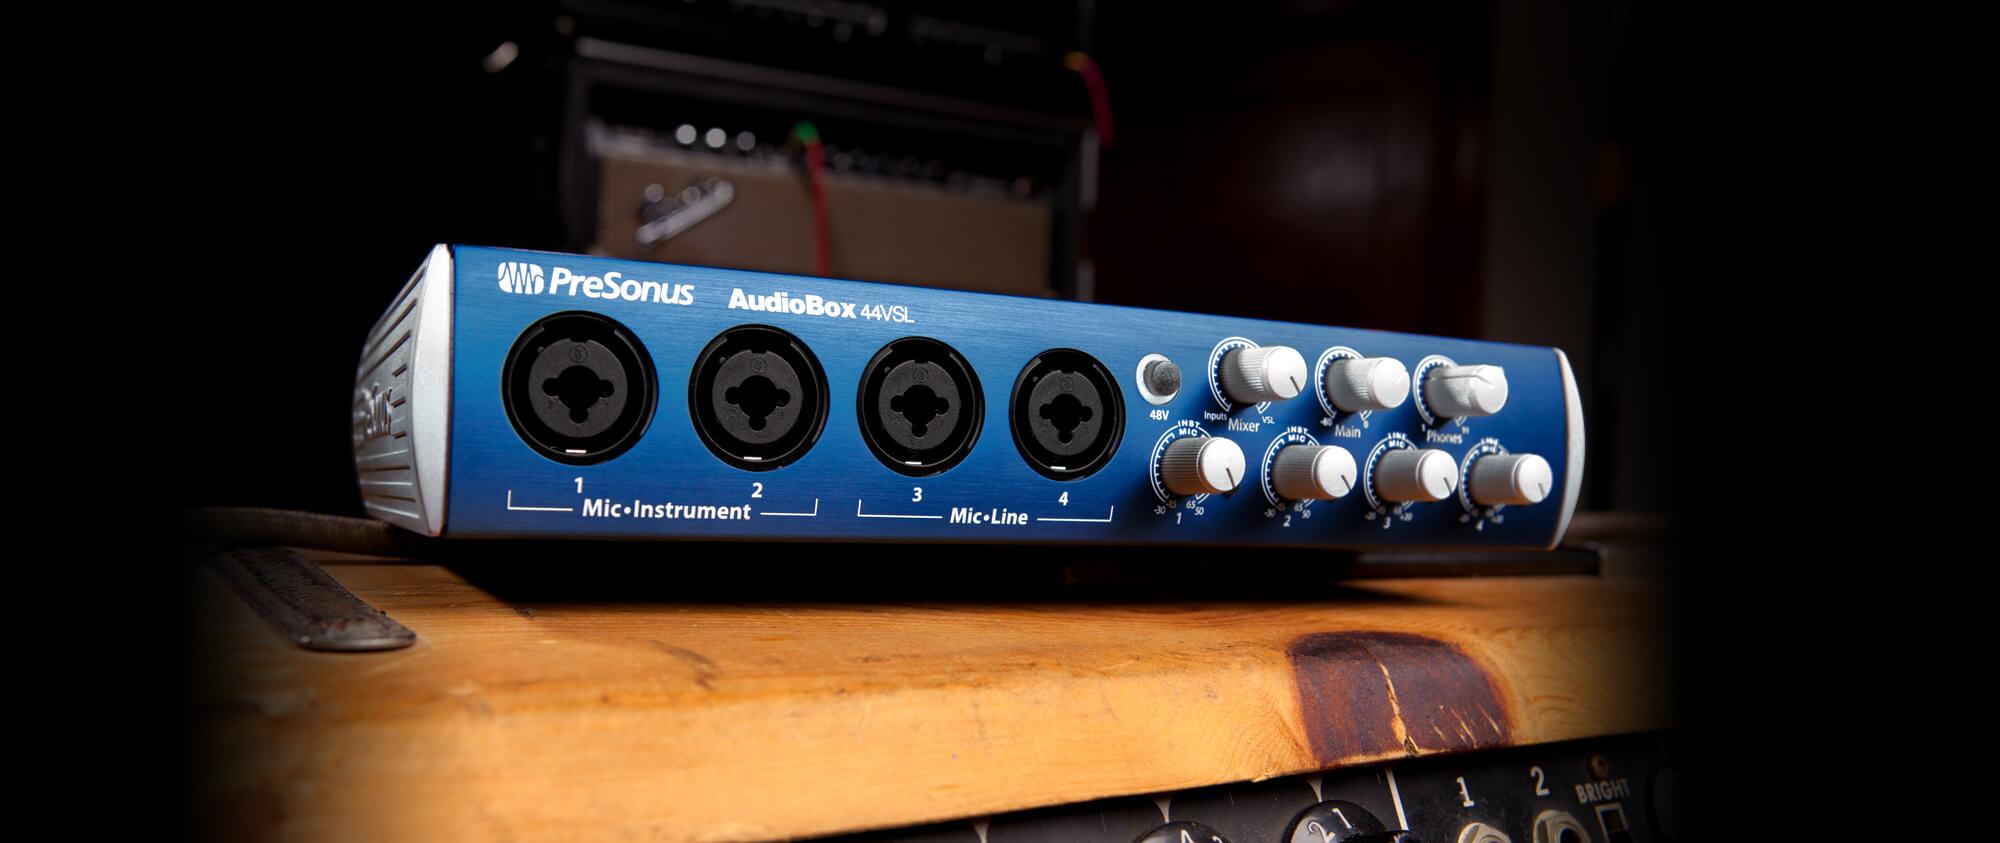 Audiobox 44vsl Presonus Simple Microphone Mixer Circuit With Op Amp Mic Pre